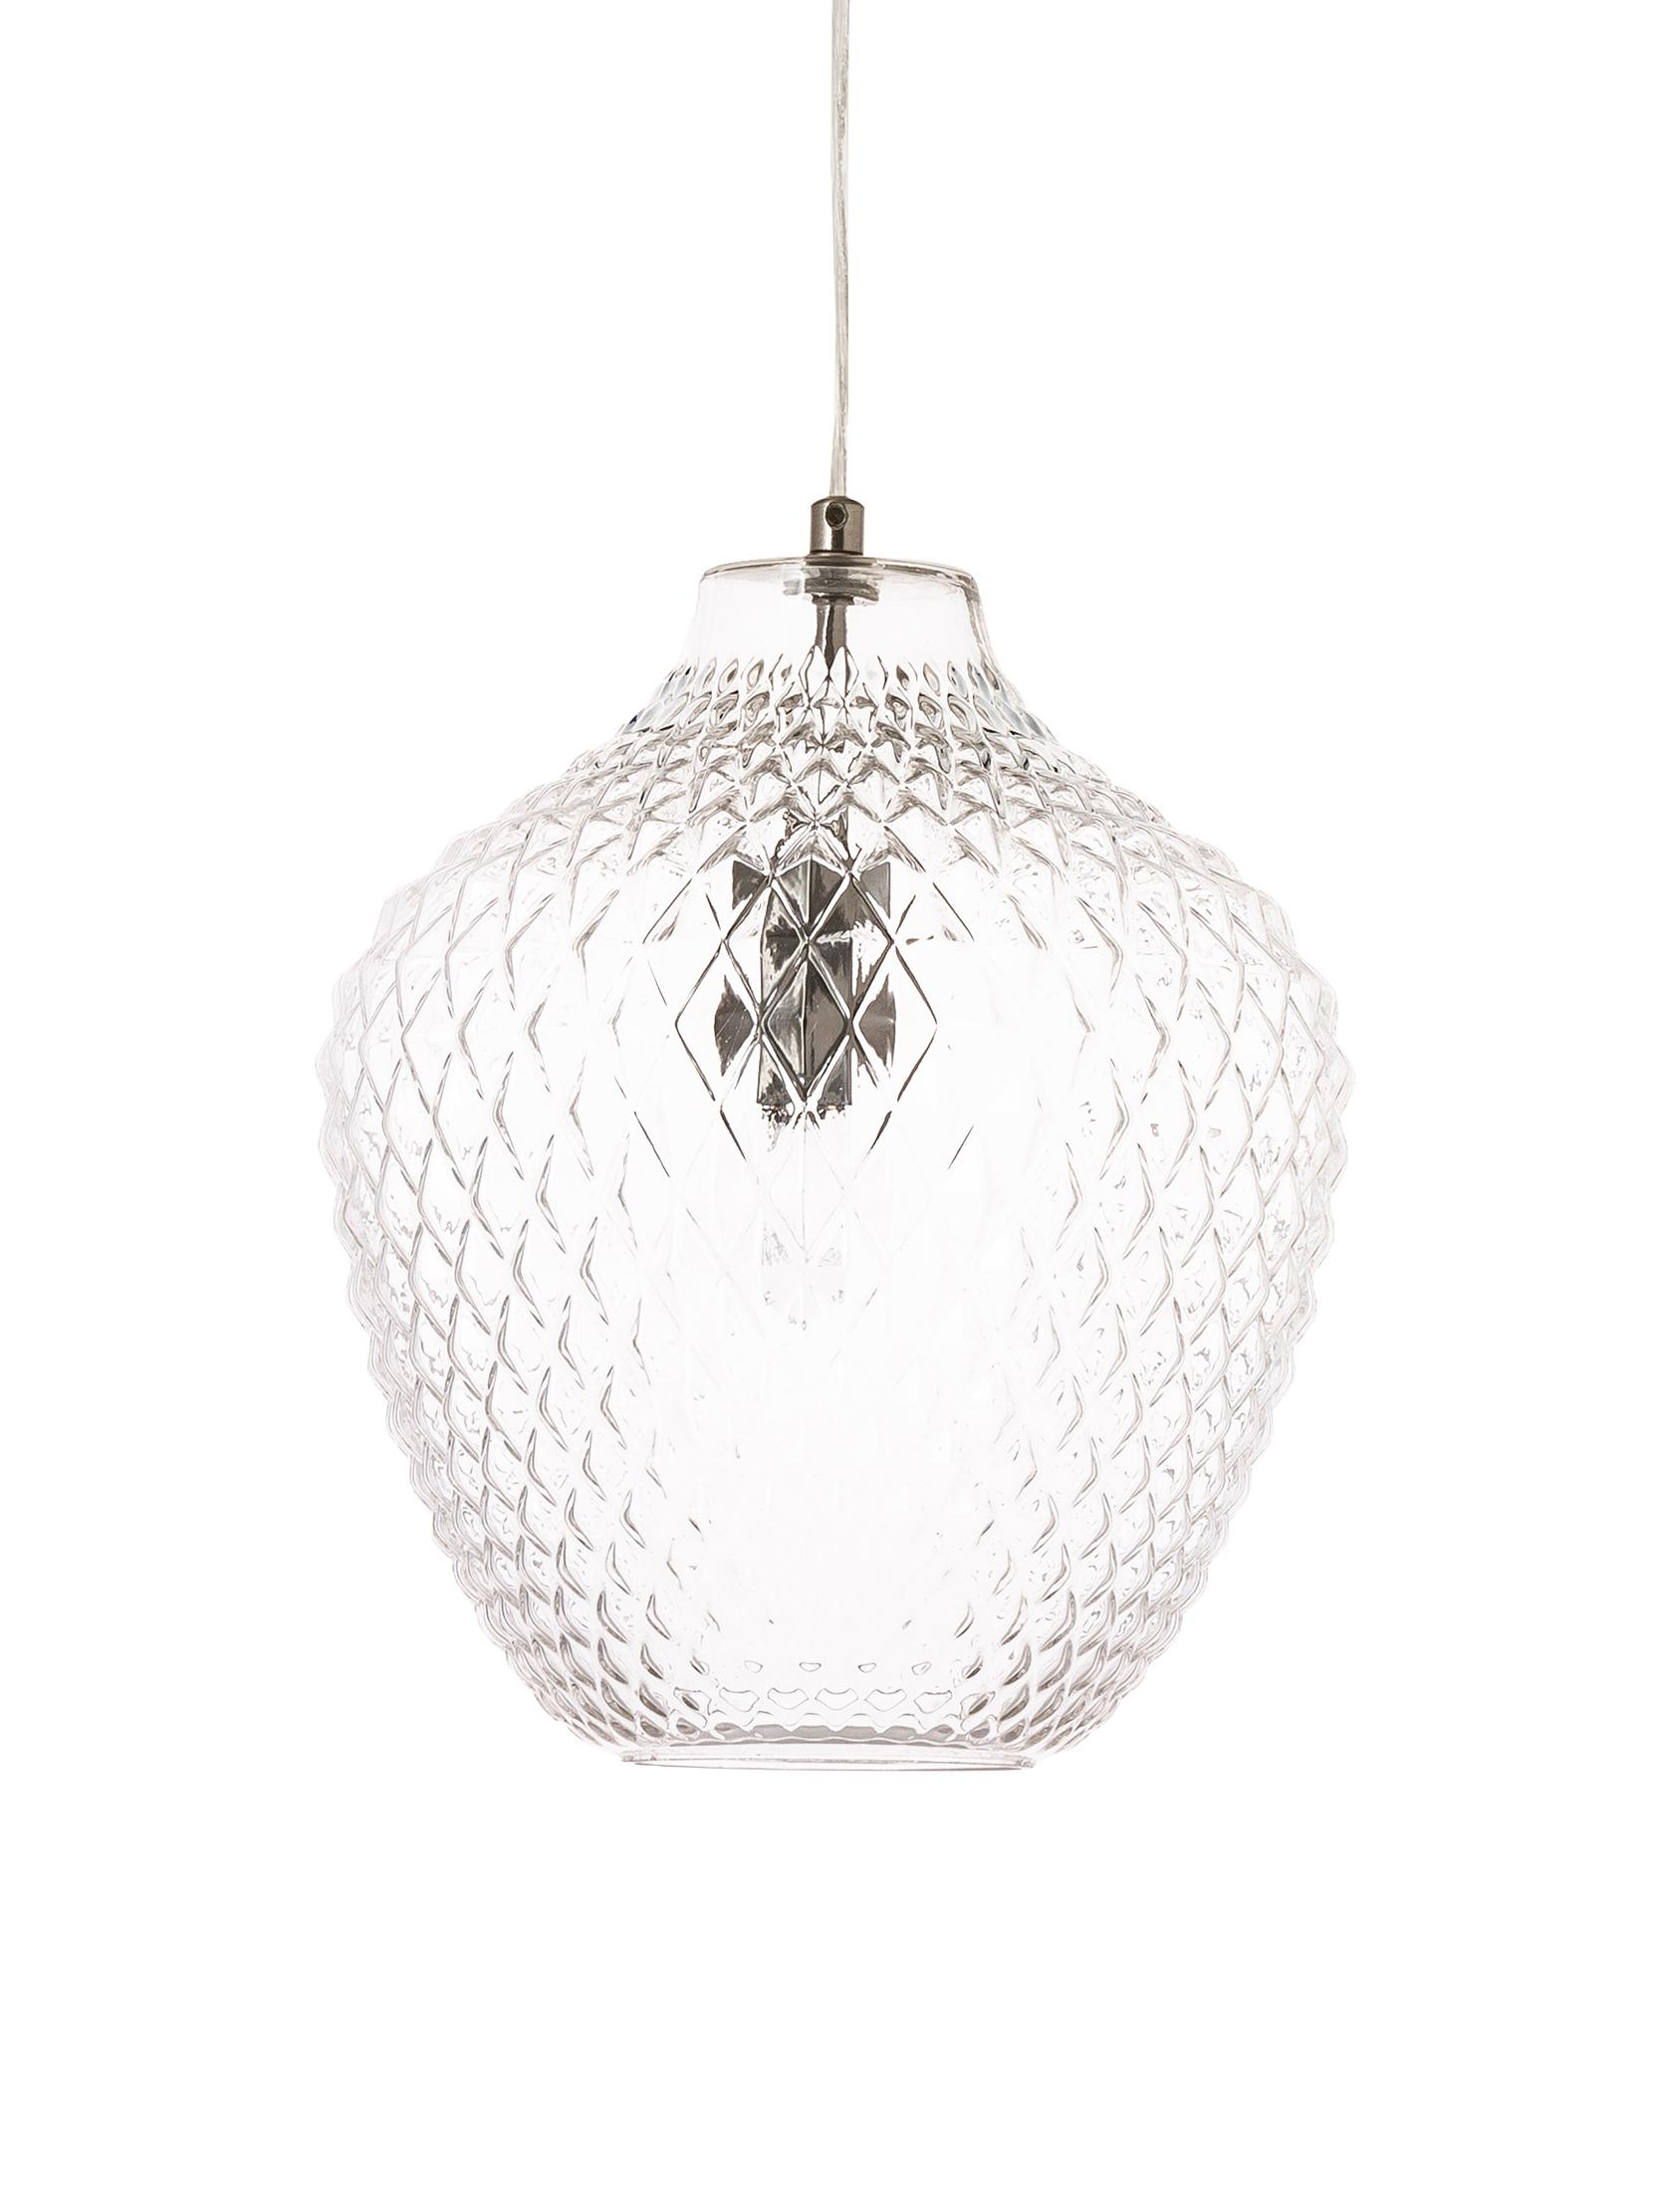 Hanglamp Lee van glas, Lampenkap: glas, Baldakijn en fitting: chroomkleurig. Lampenkap: transparant, Ø 27 x H 33 cm